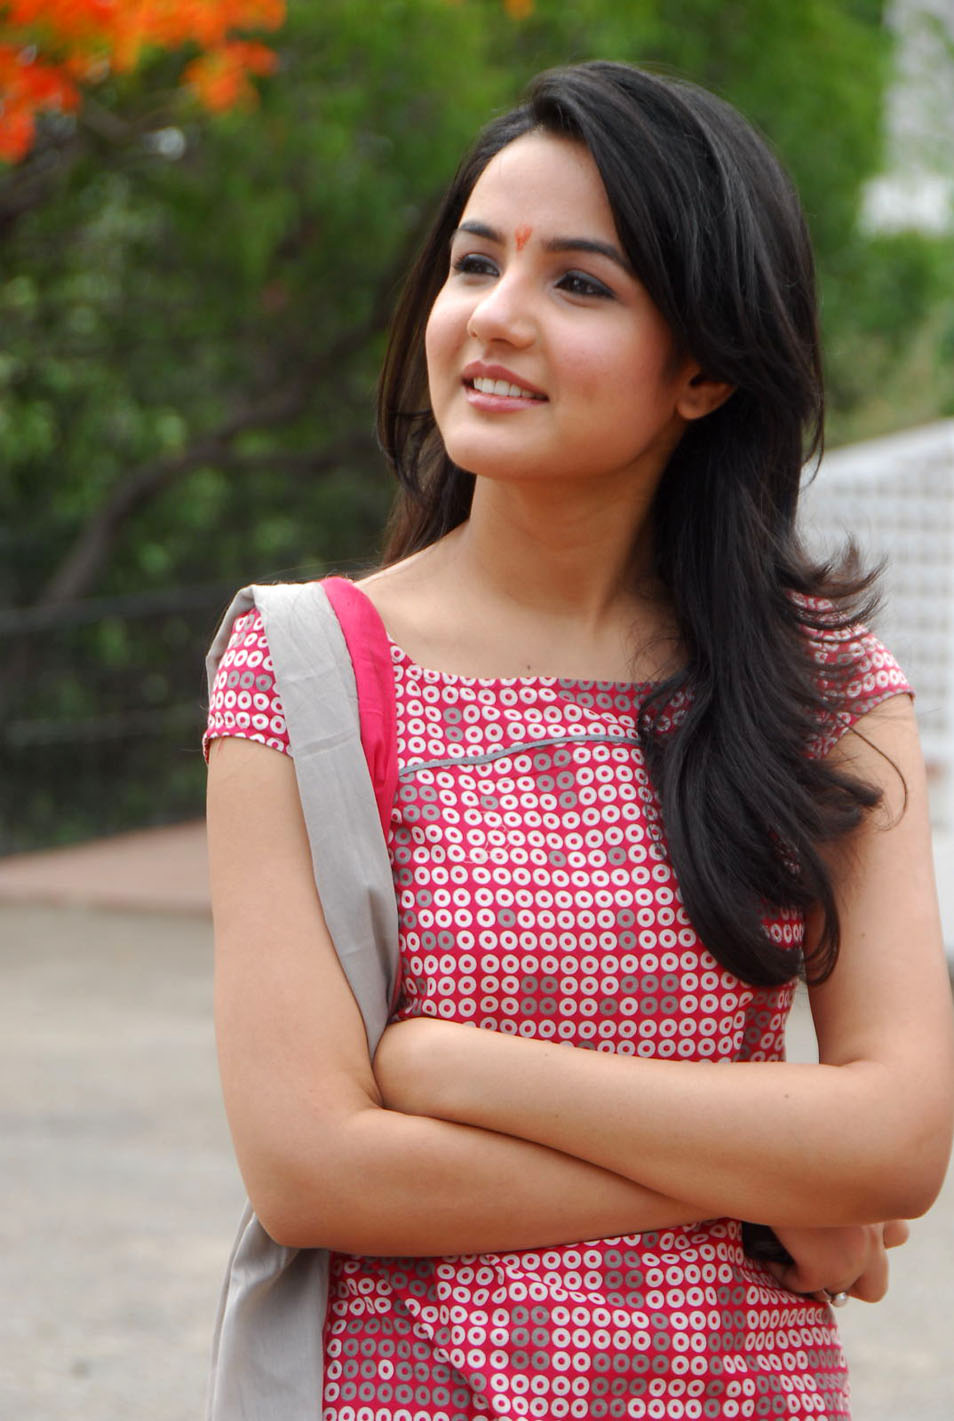 Gujarati indian college babe jasmine mathur garba dance and showing bobbs - 5 3